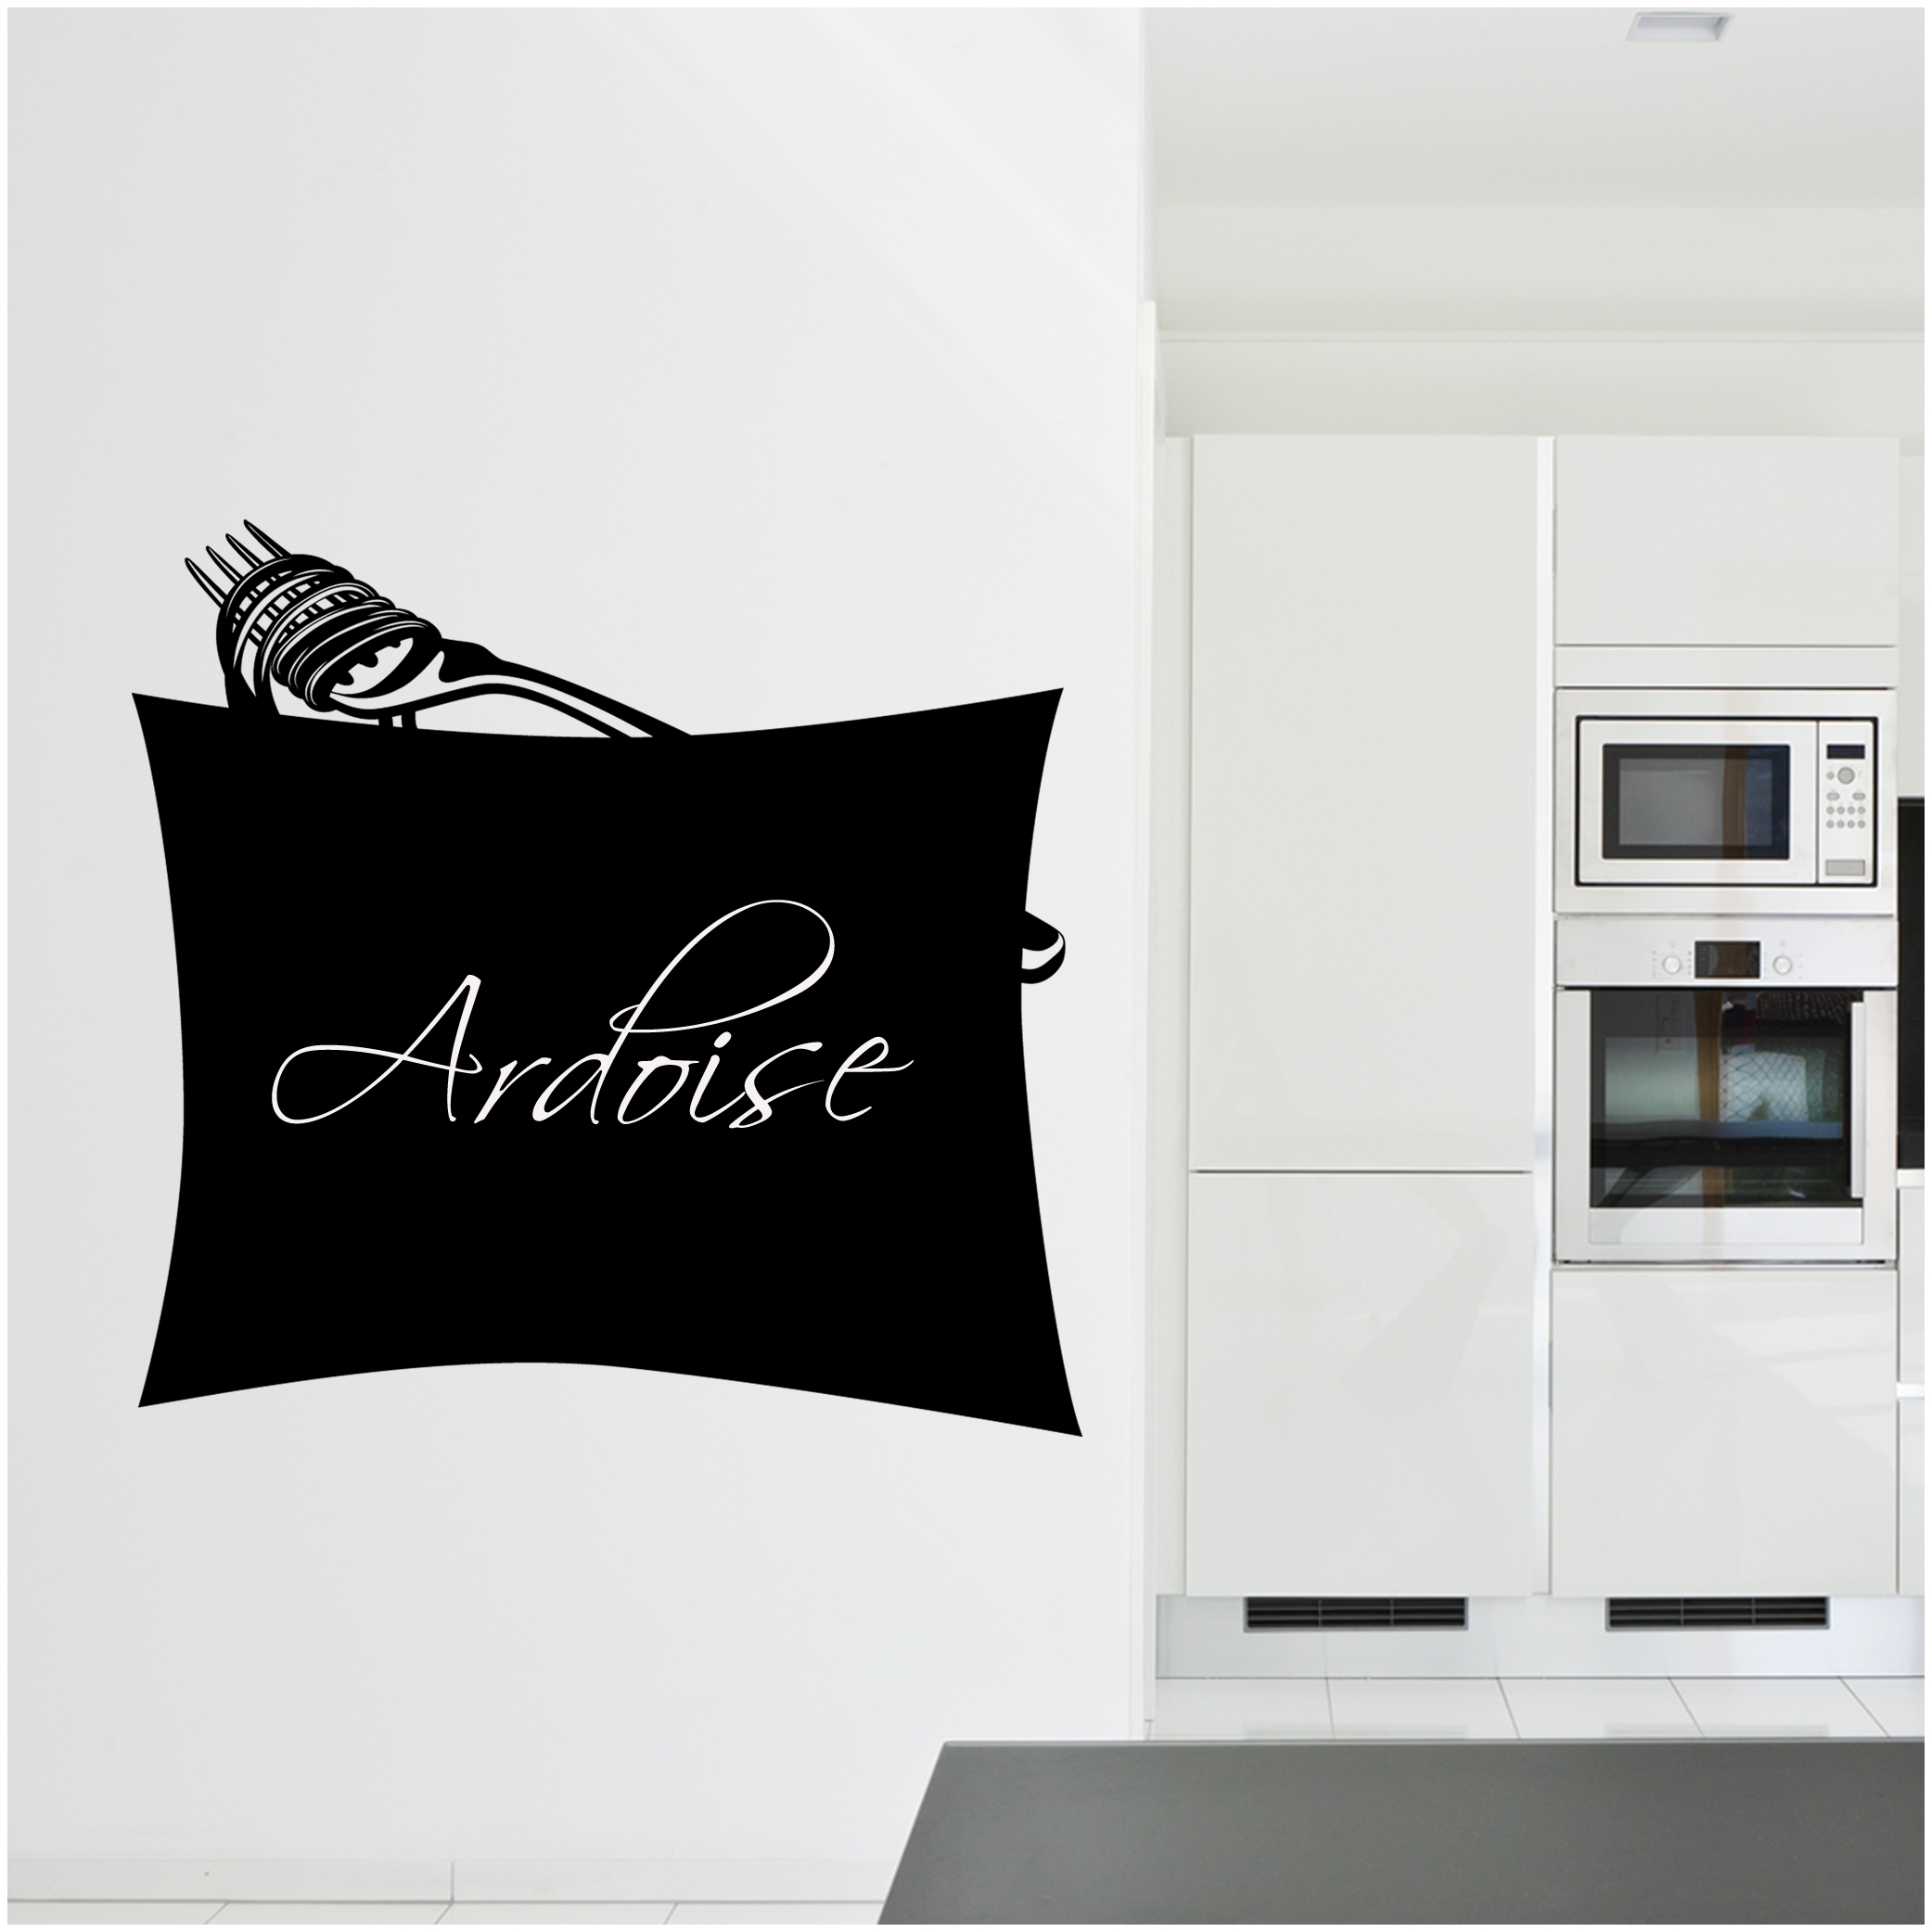 stickers ardoise fourchette pas cher. Black Bedroom Furniture Sets. Home Design Ideas